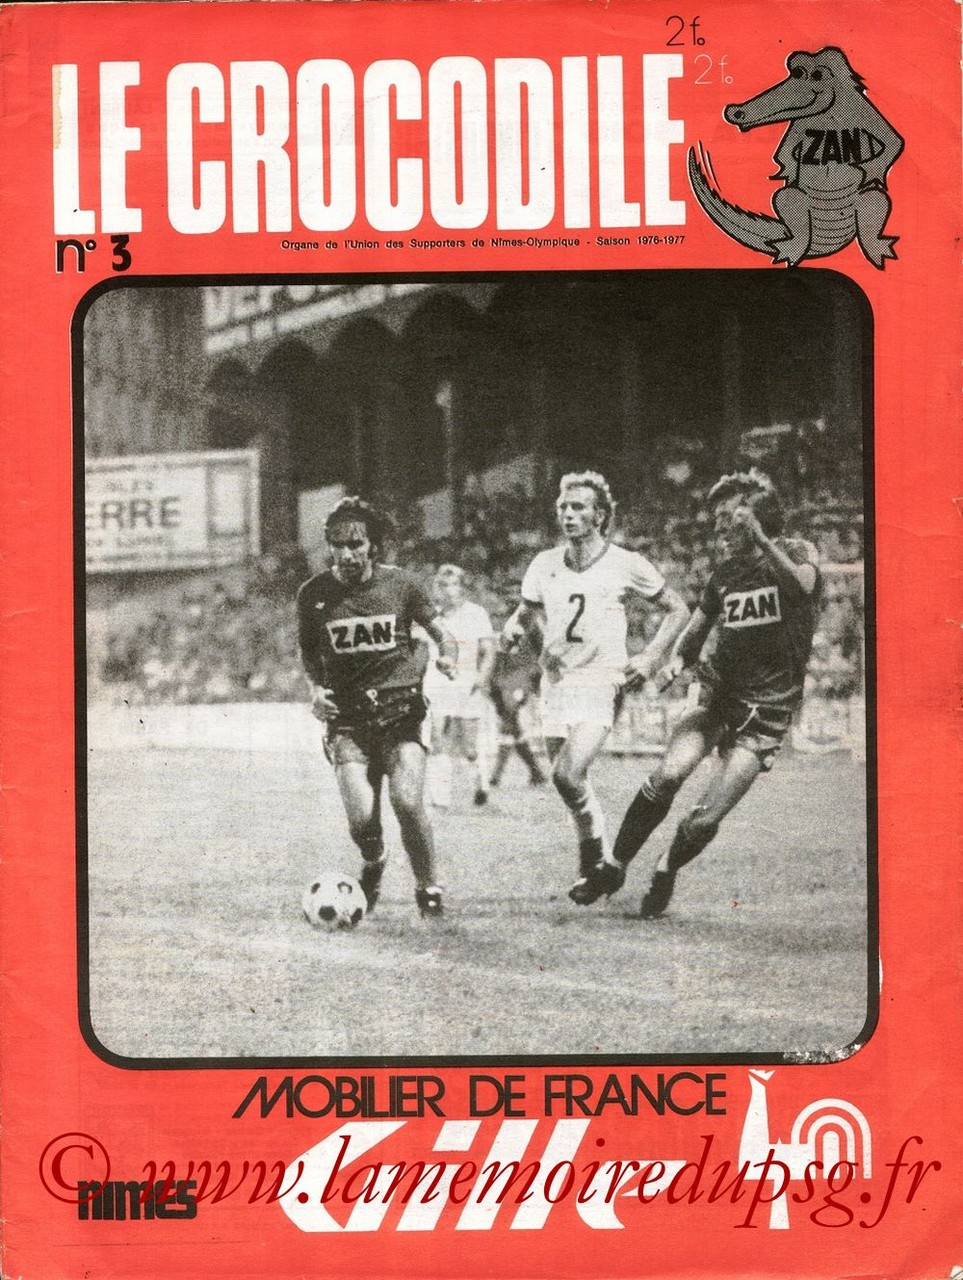 1976-09-16  Nîmes-PSG (5ème D1, Le Crocodile N°3)